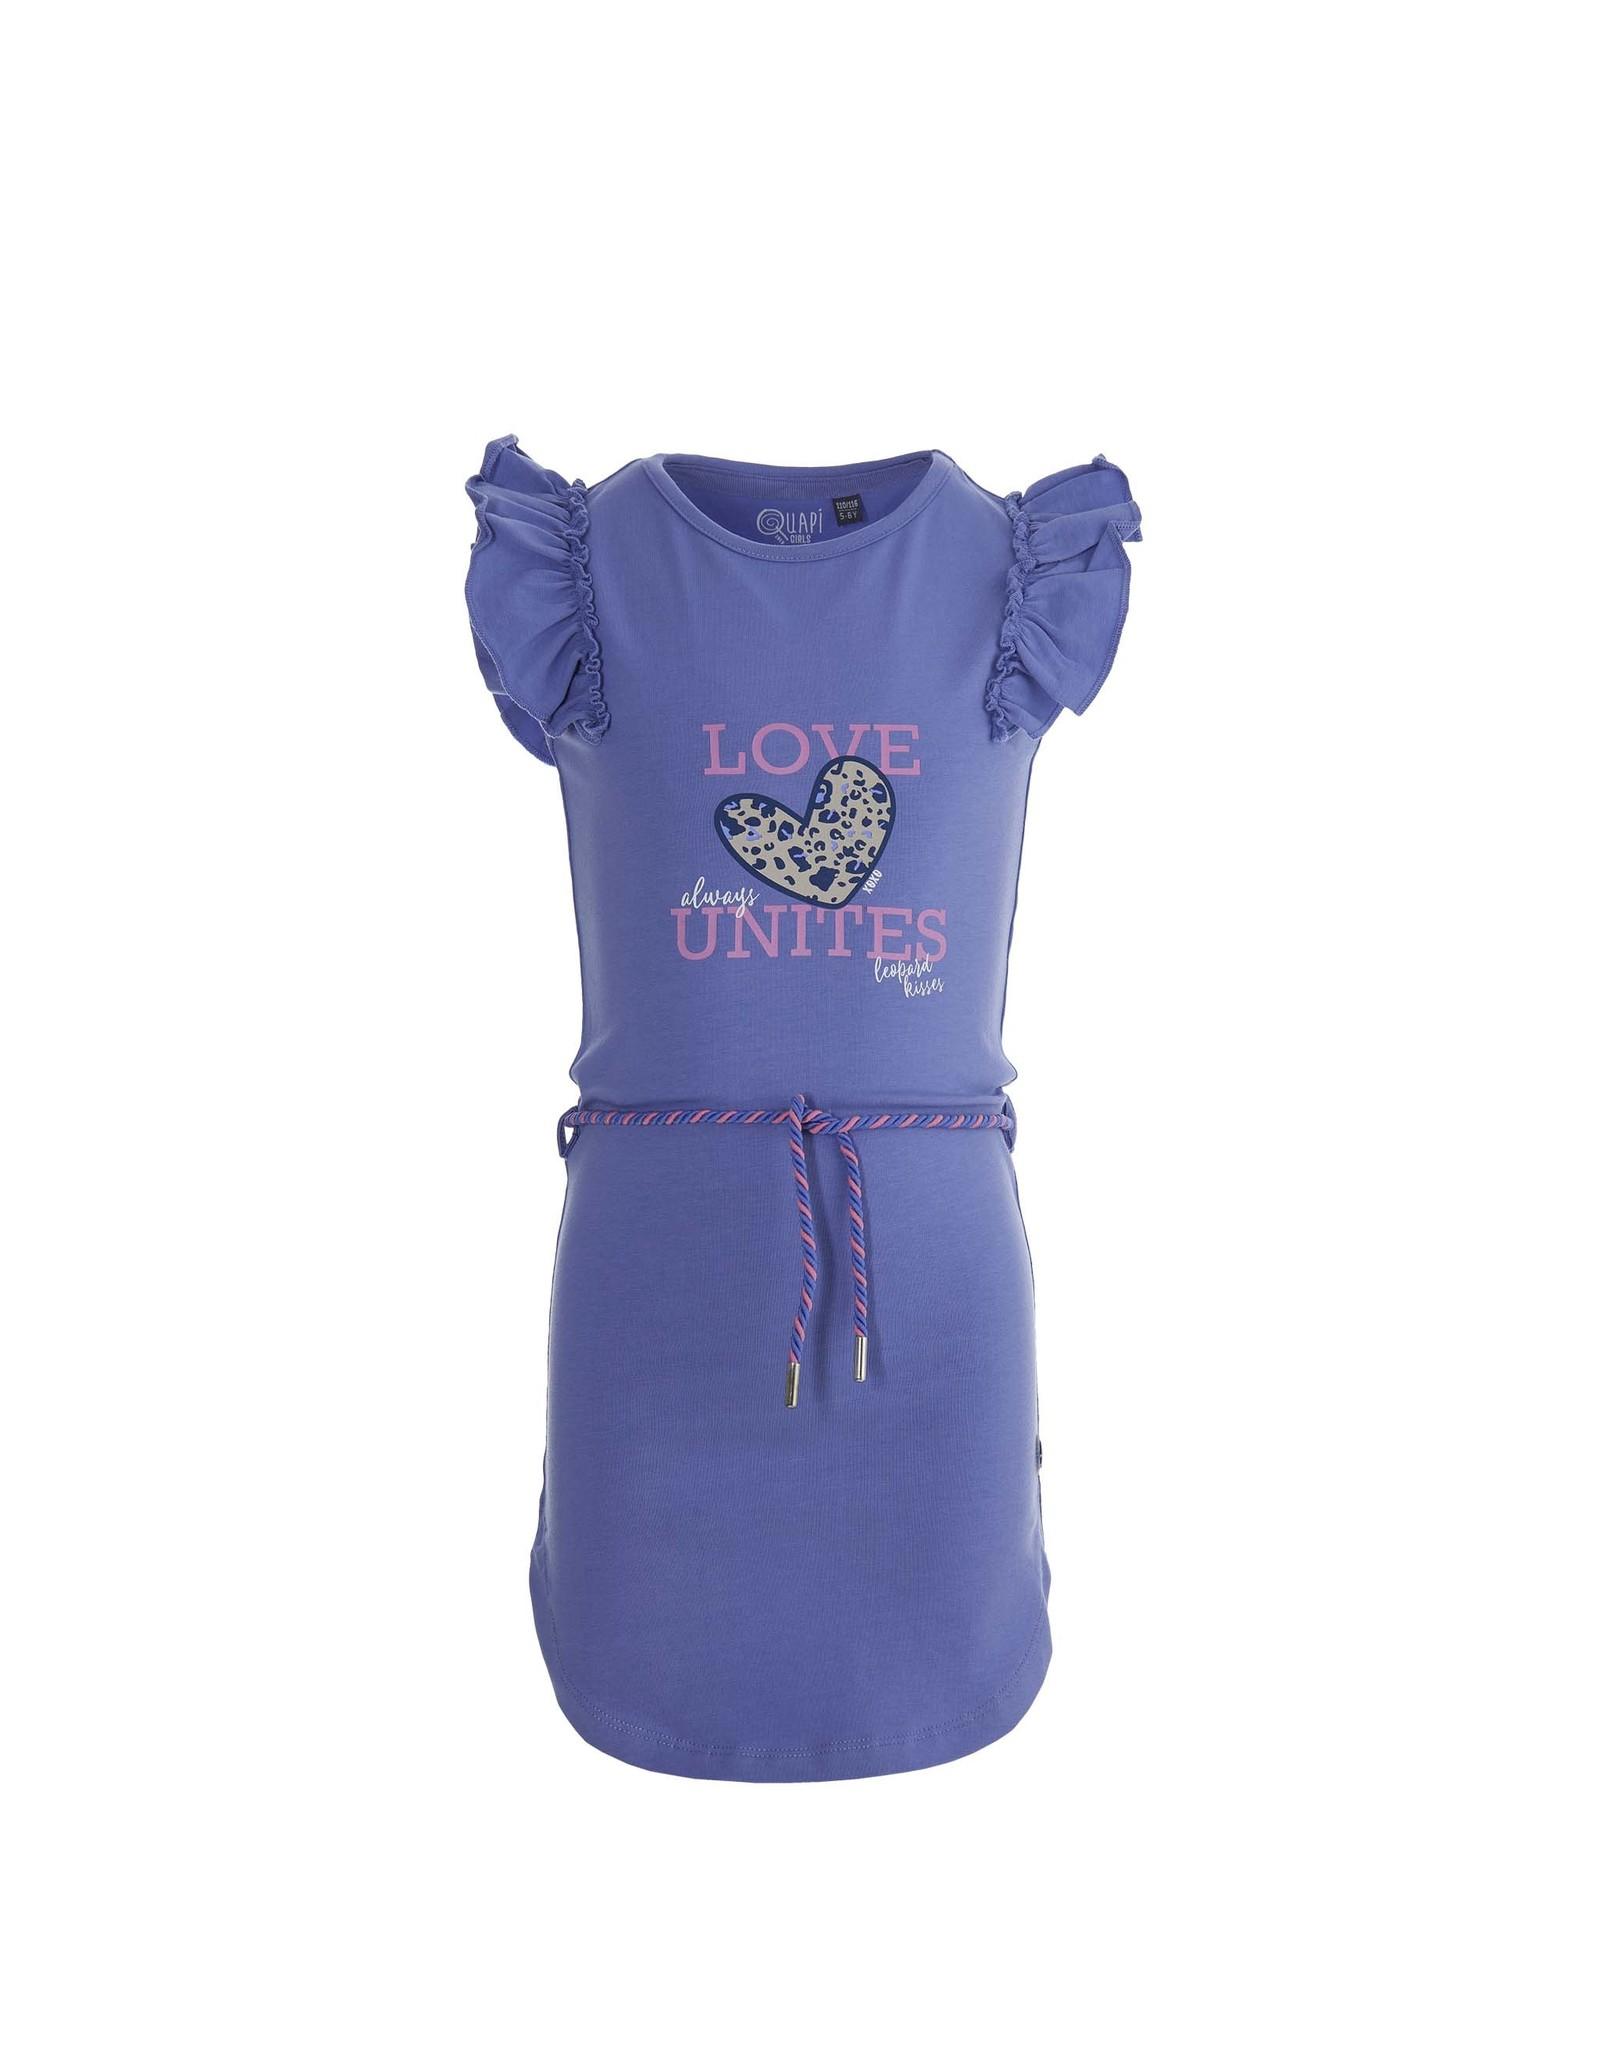 Quapi Quapi meisjes korte mouwen jurk Fee Lilac Summer